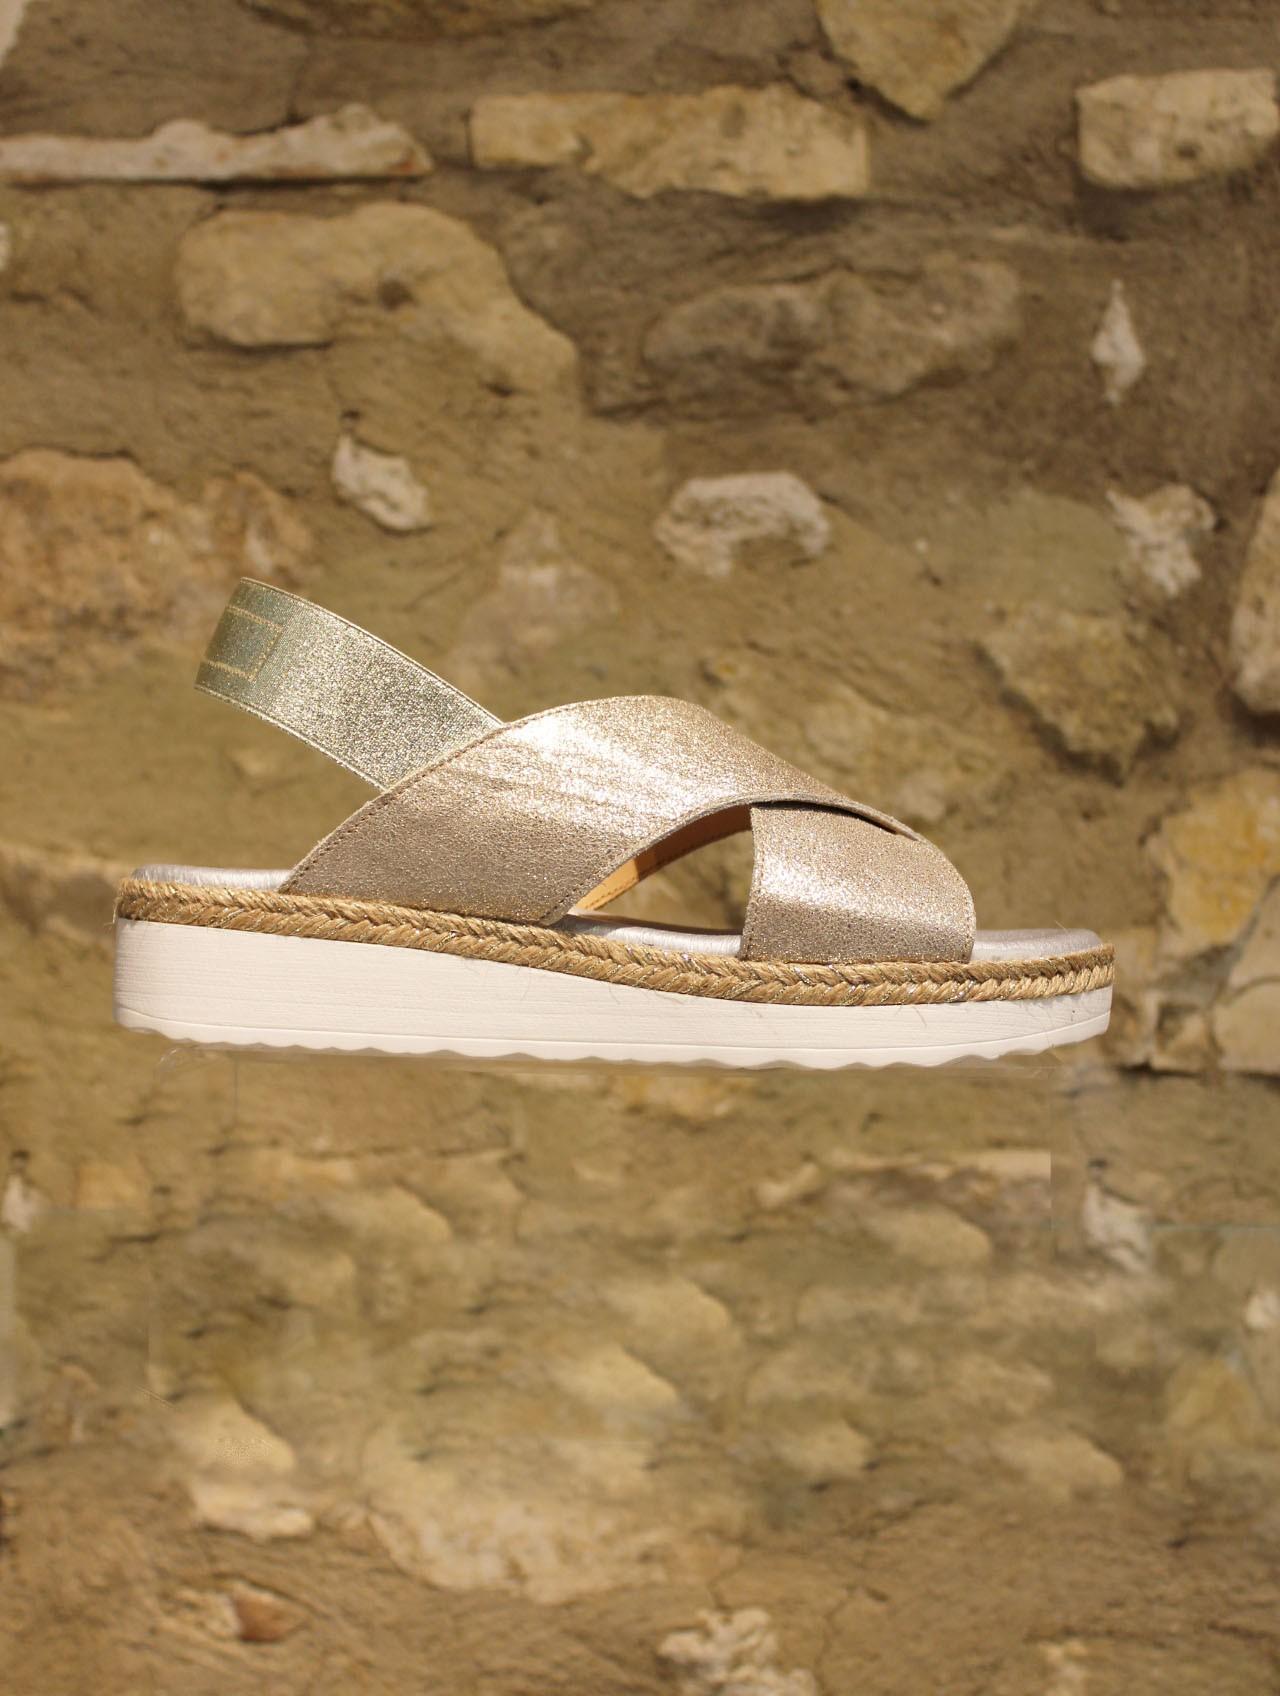 Semelle Offerte ConfortLivraison Dorée Sur Gomme Ultra Sandale k8n0ZNwOPX